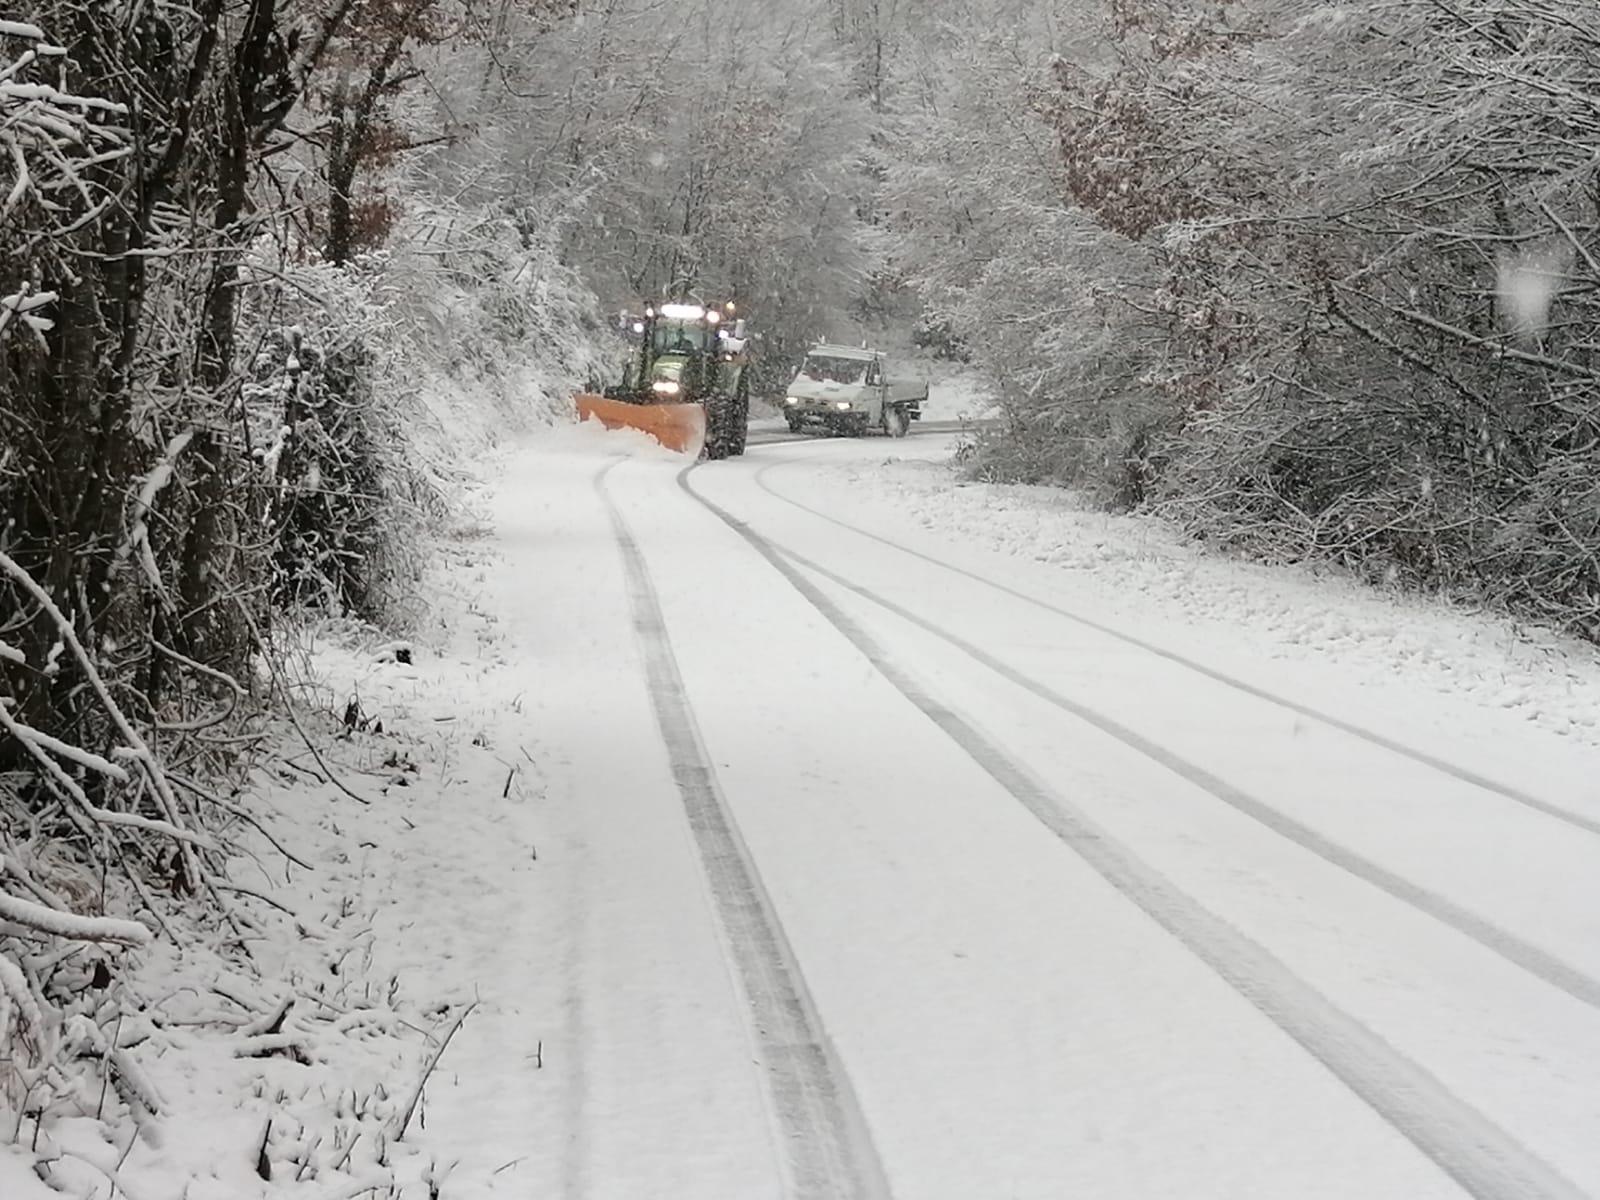 Viabilità – Valnerina, nevica abbondantemente da stamattina